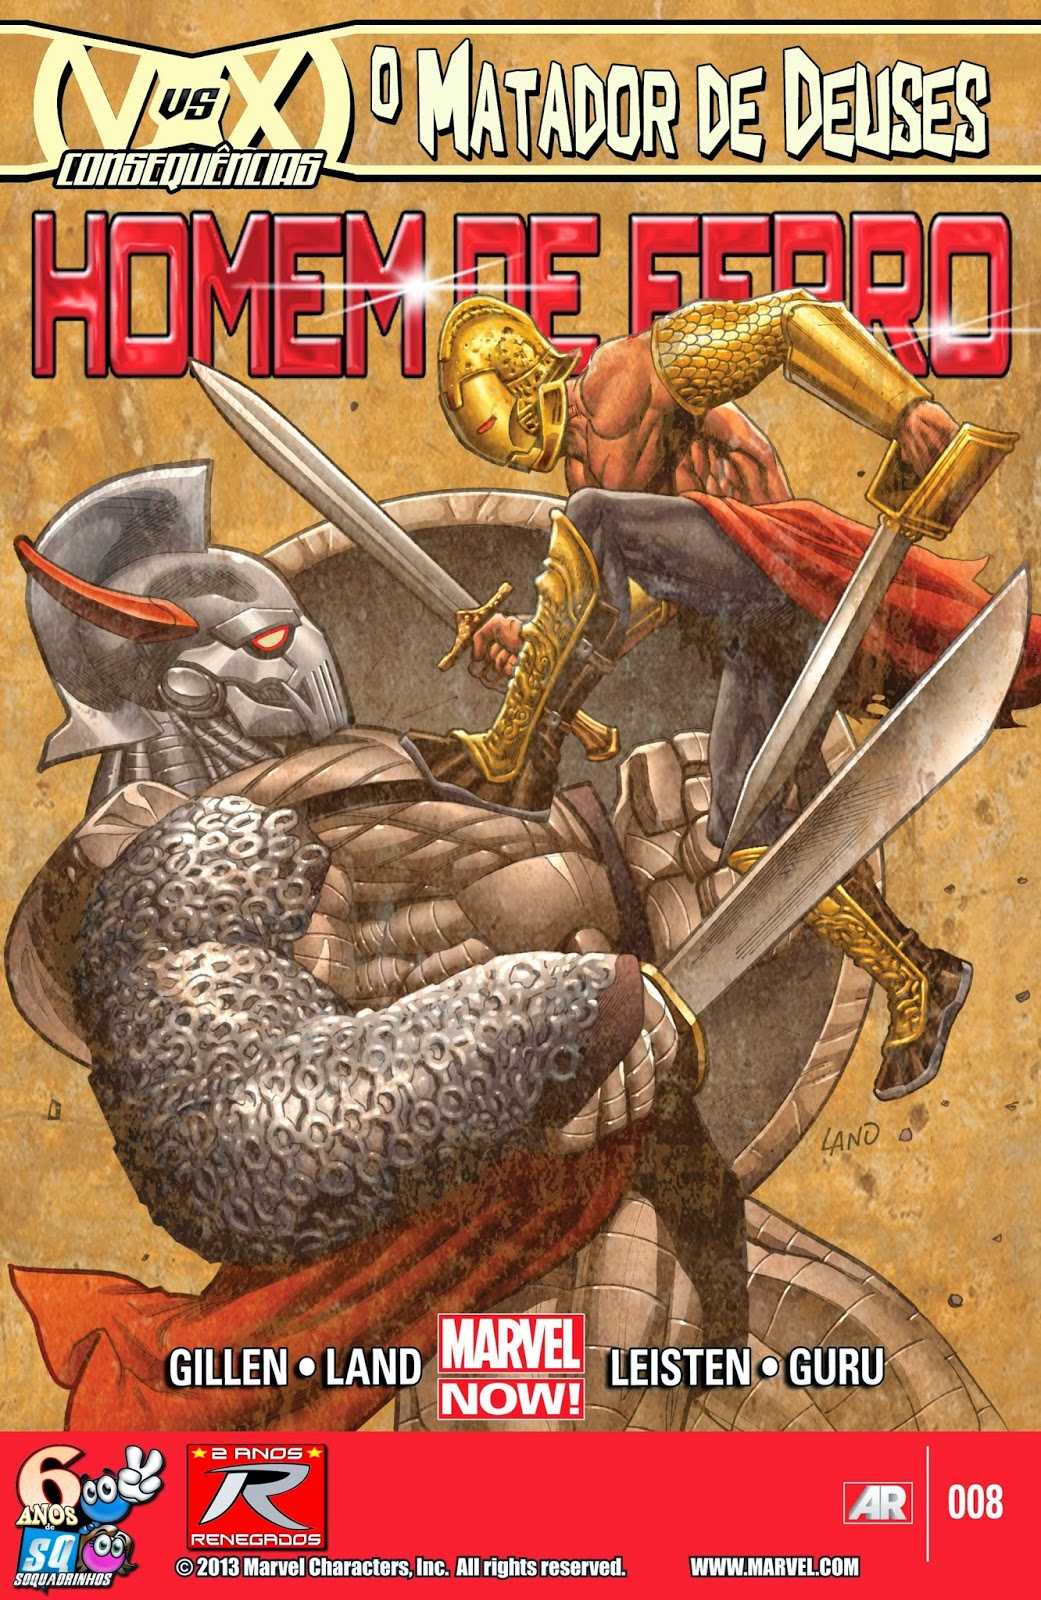 Nova Marvel! Homem de Ferro v6 #8